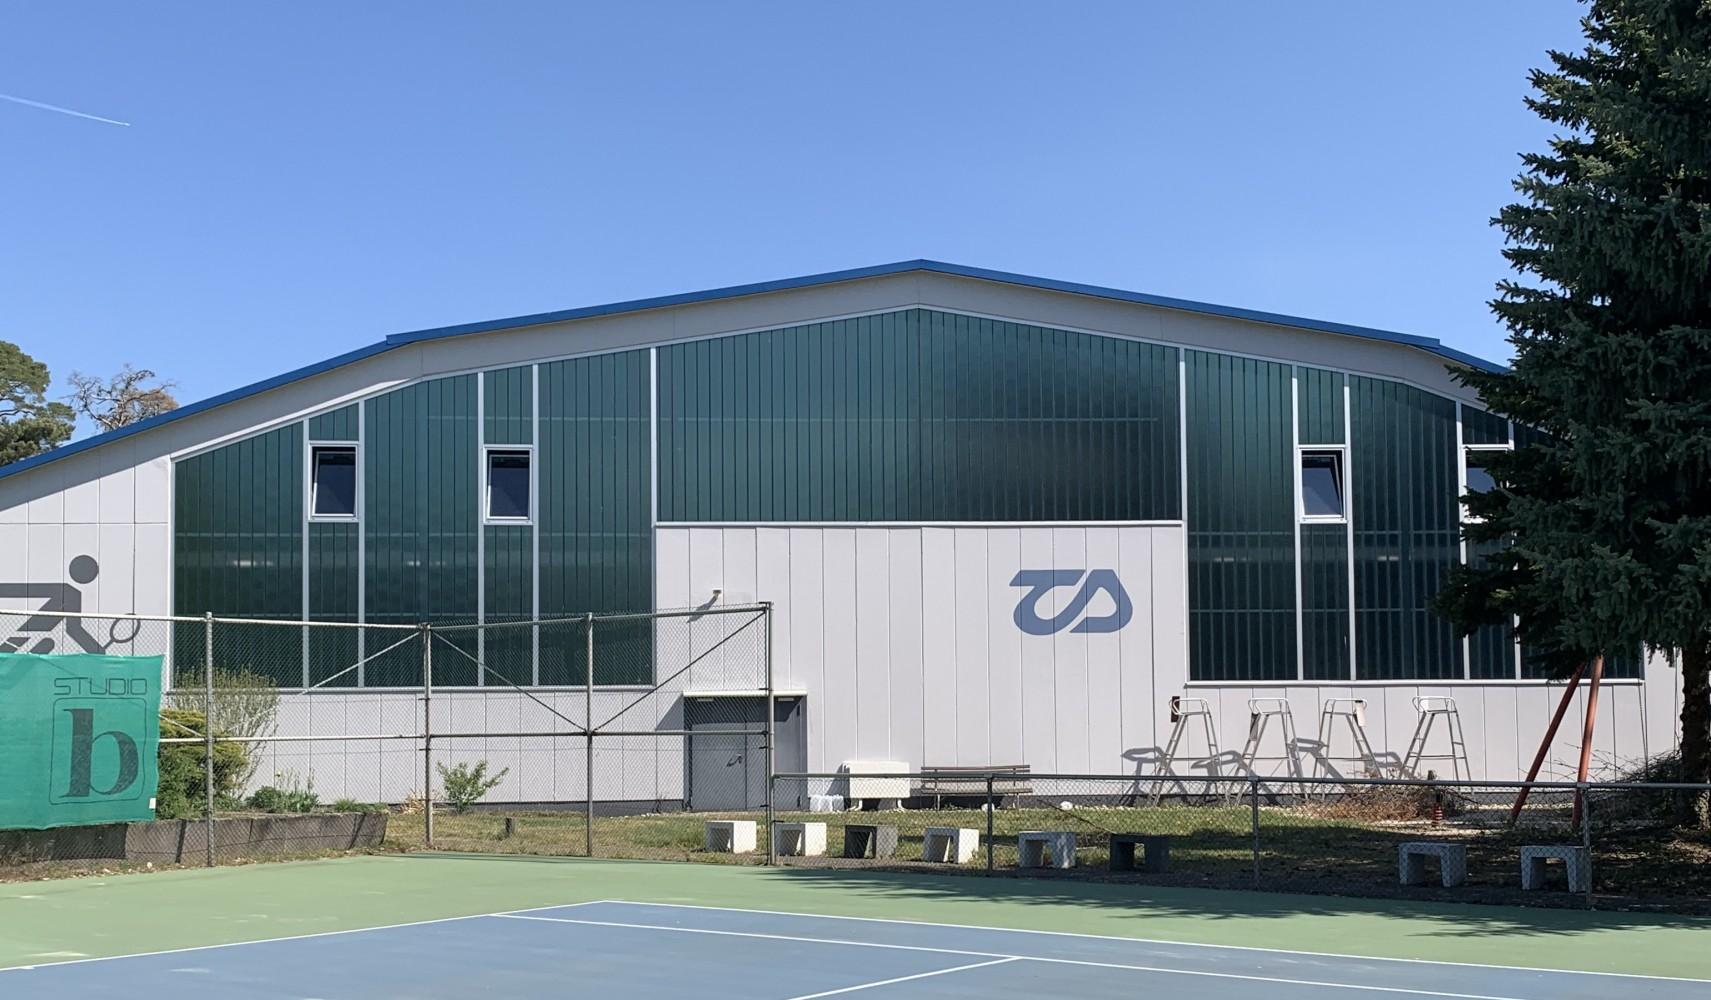 tennishalleapril-2020.jpg